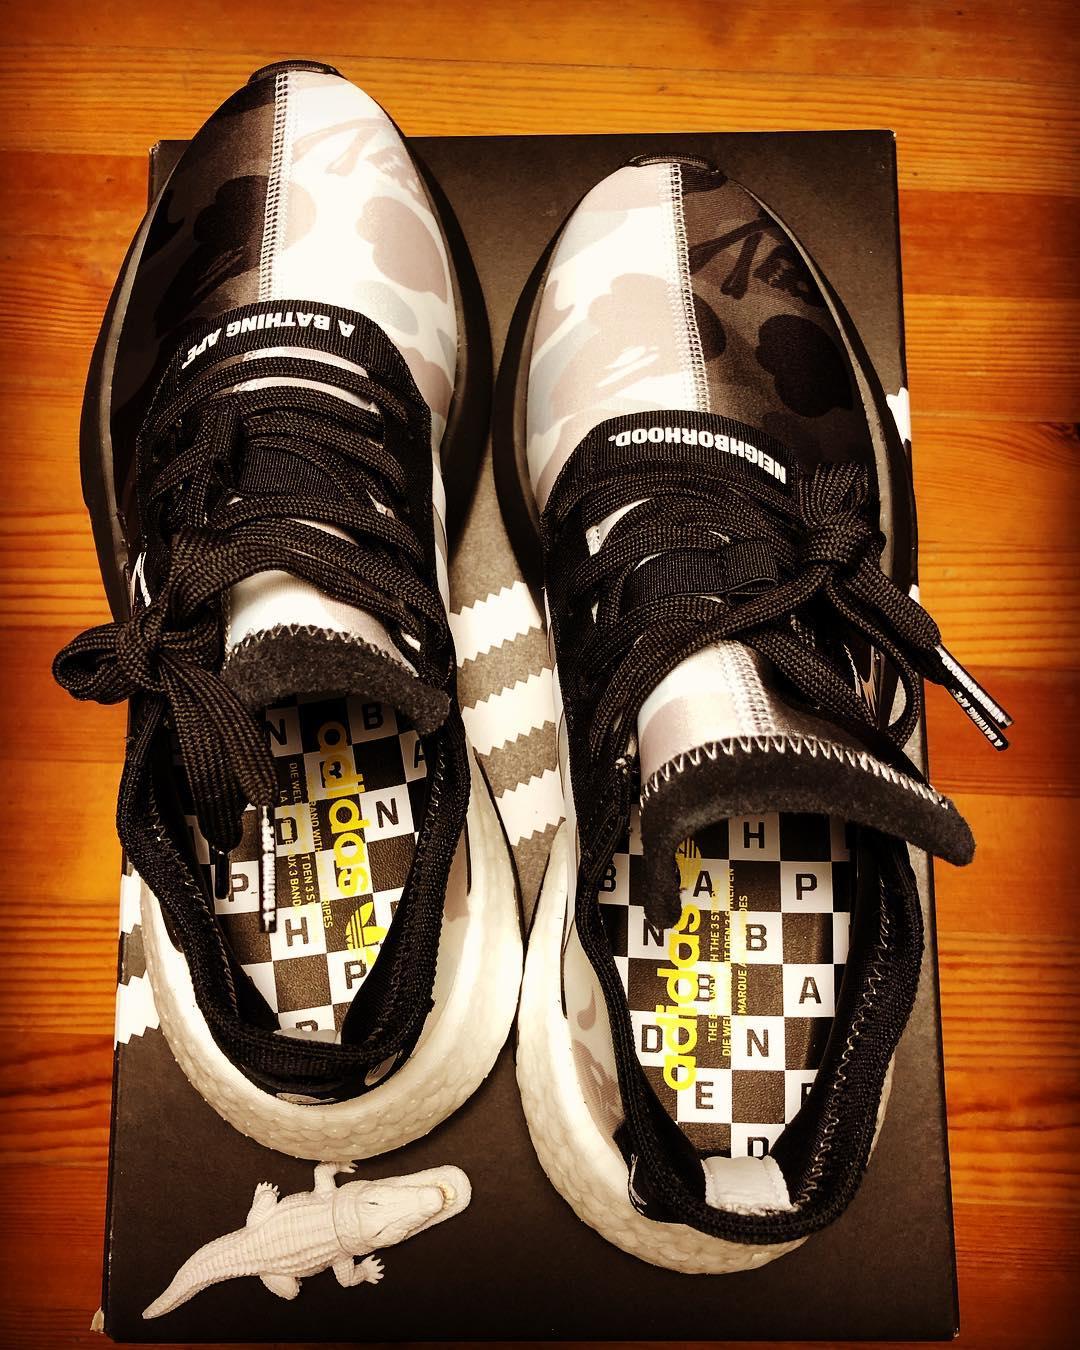 BAPE x Neighborhood x Adidas Pod S3.1 'Core Black' (1)